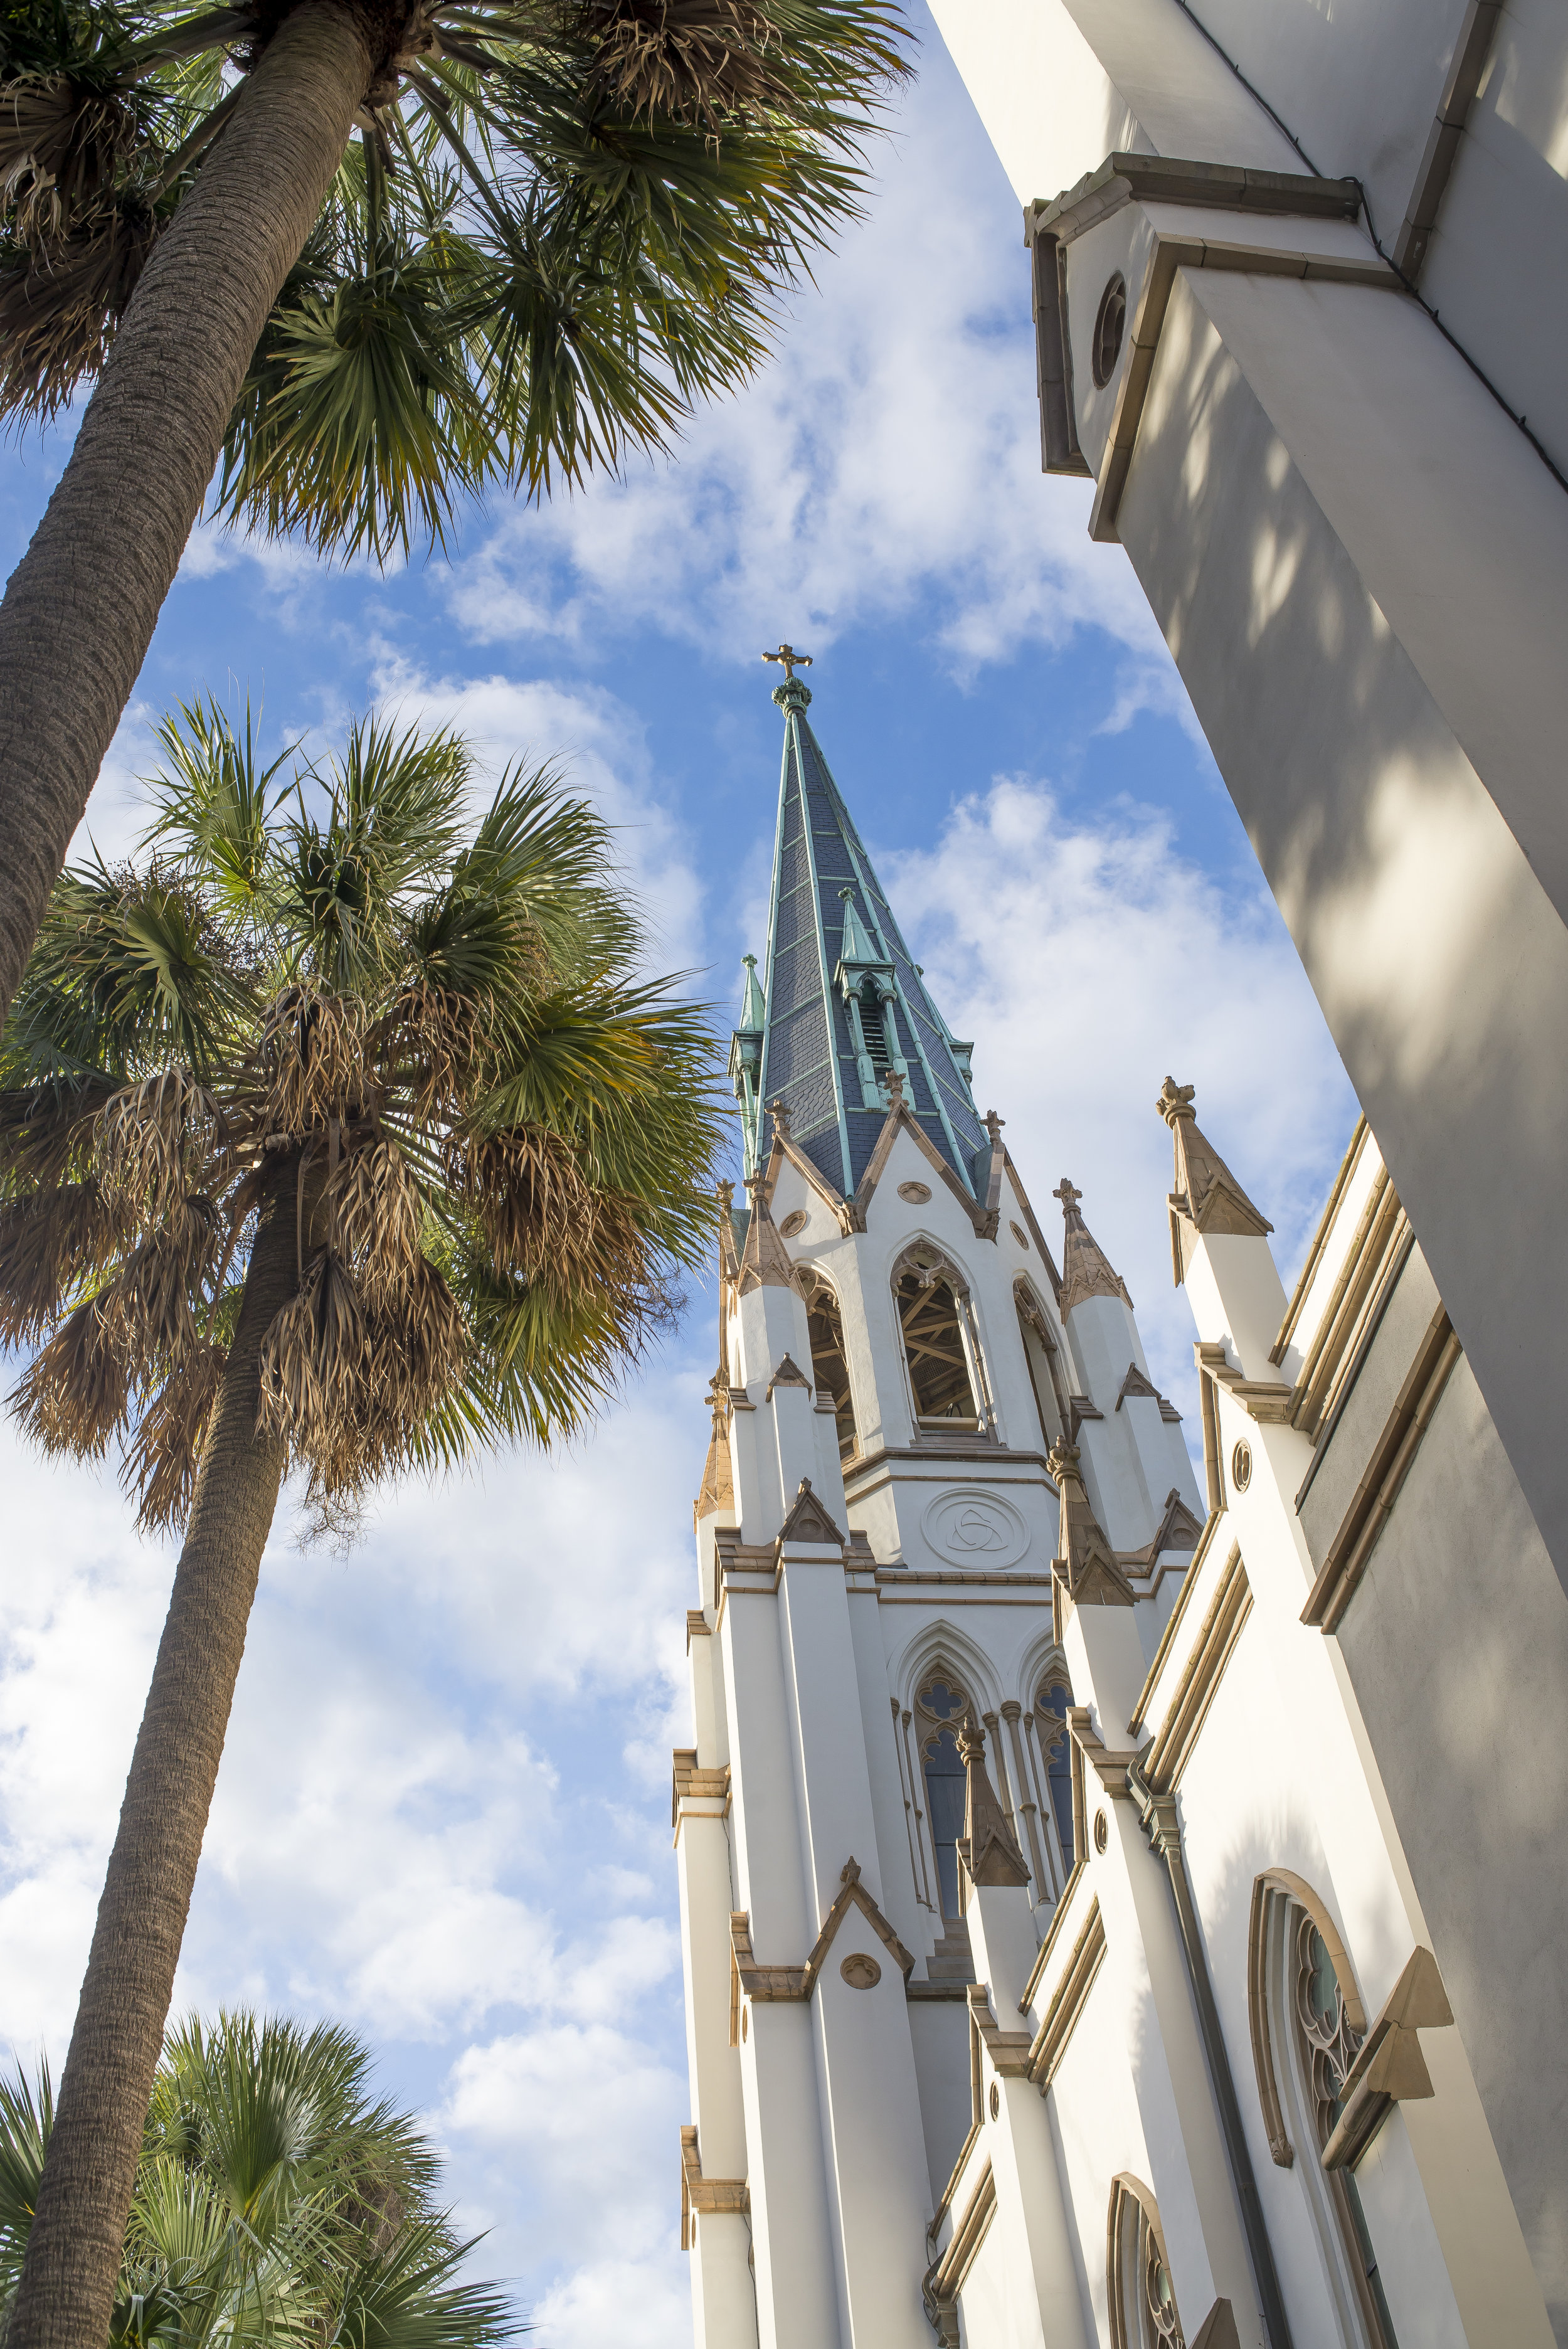 St. John the Baptist Cathedral in Savannah, GA